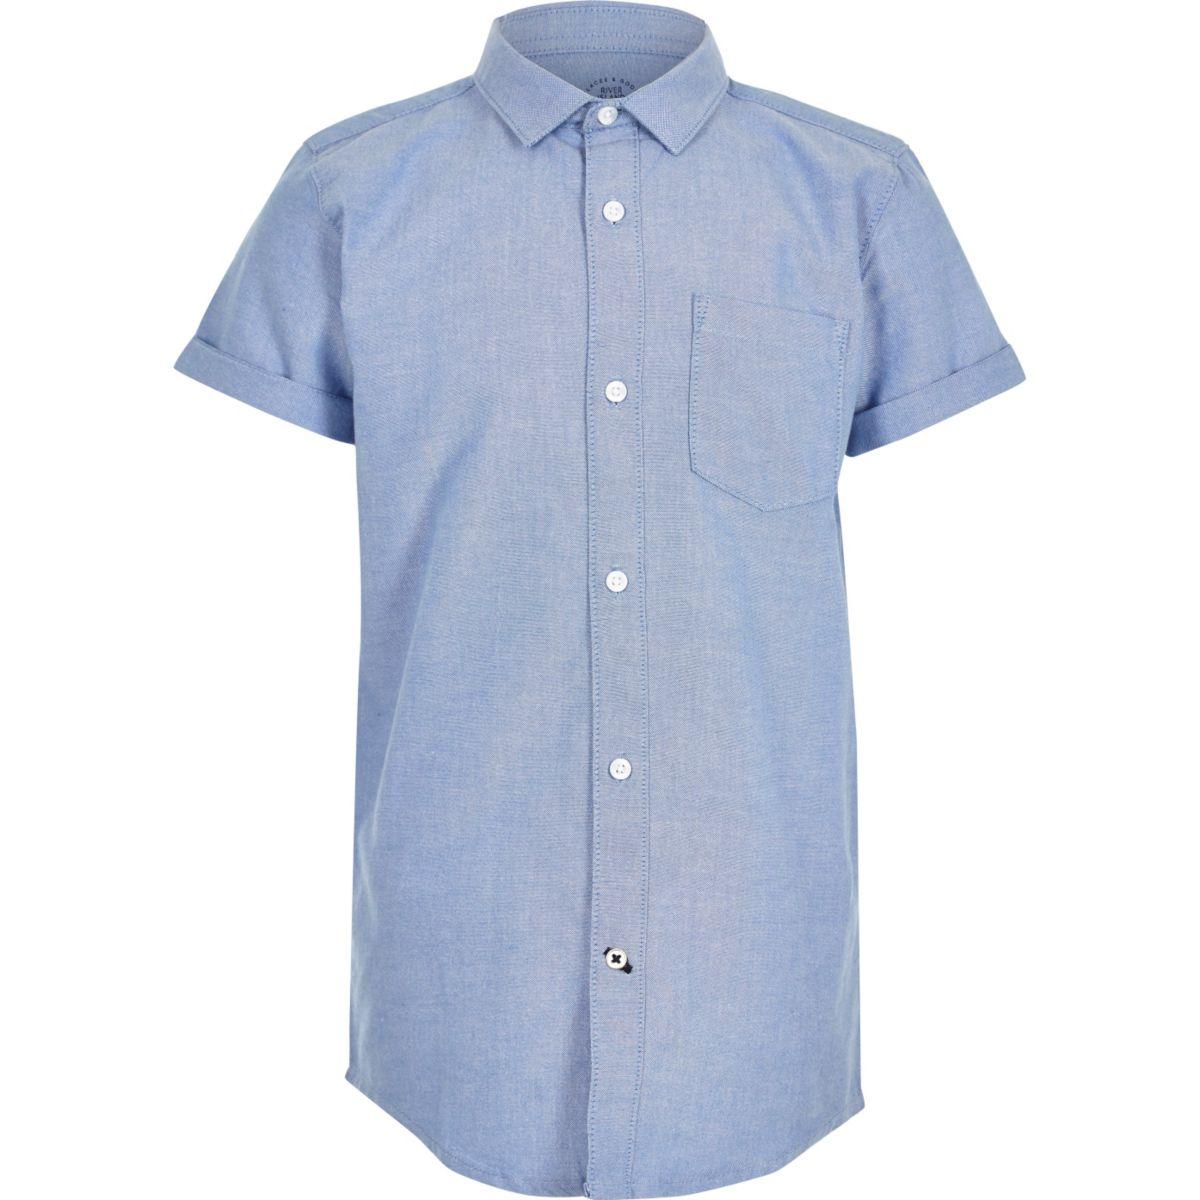 Boys blue short sleeve Oxford shirt